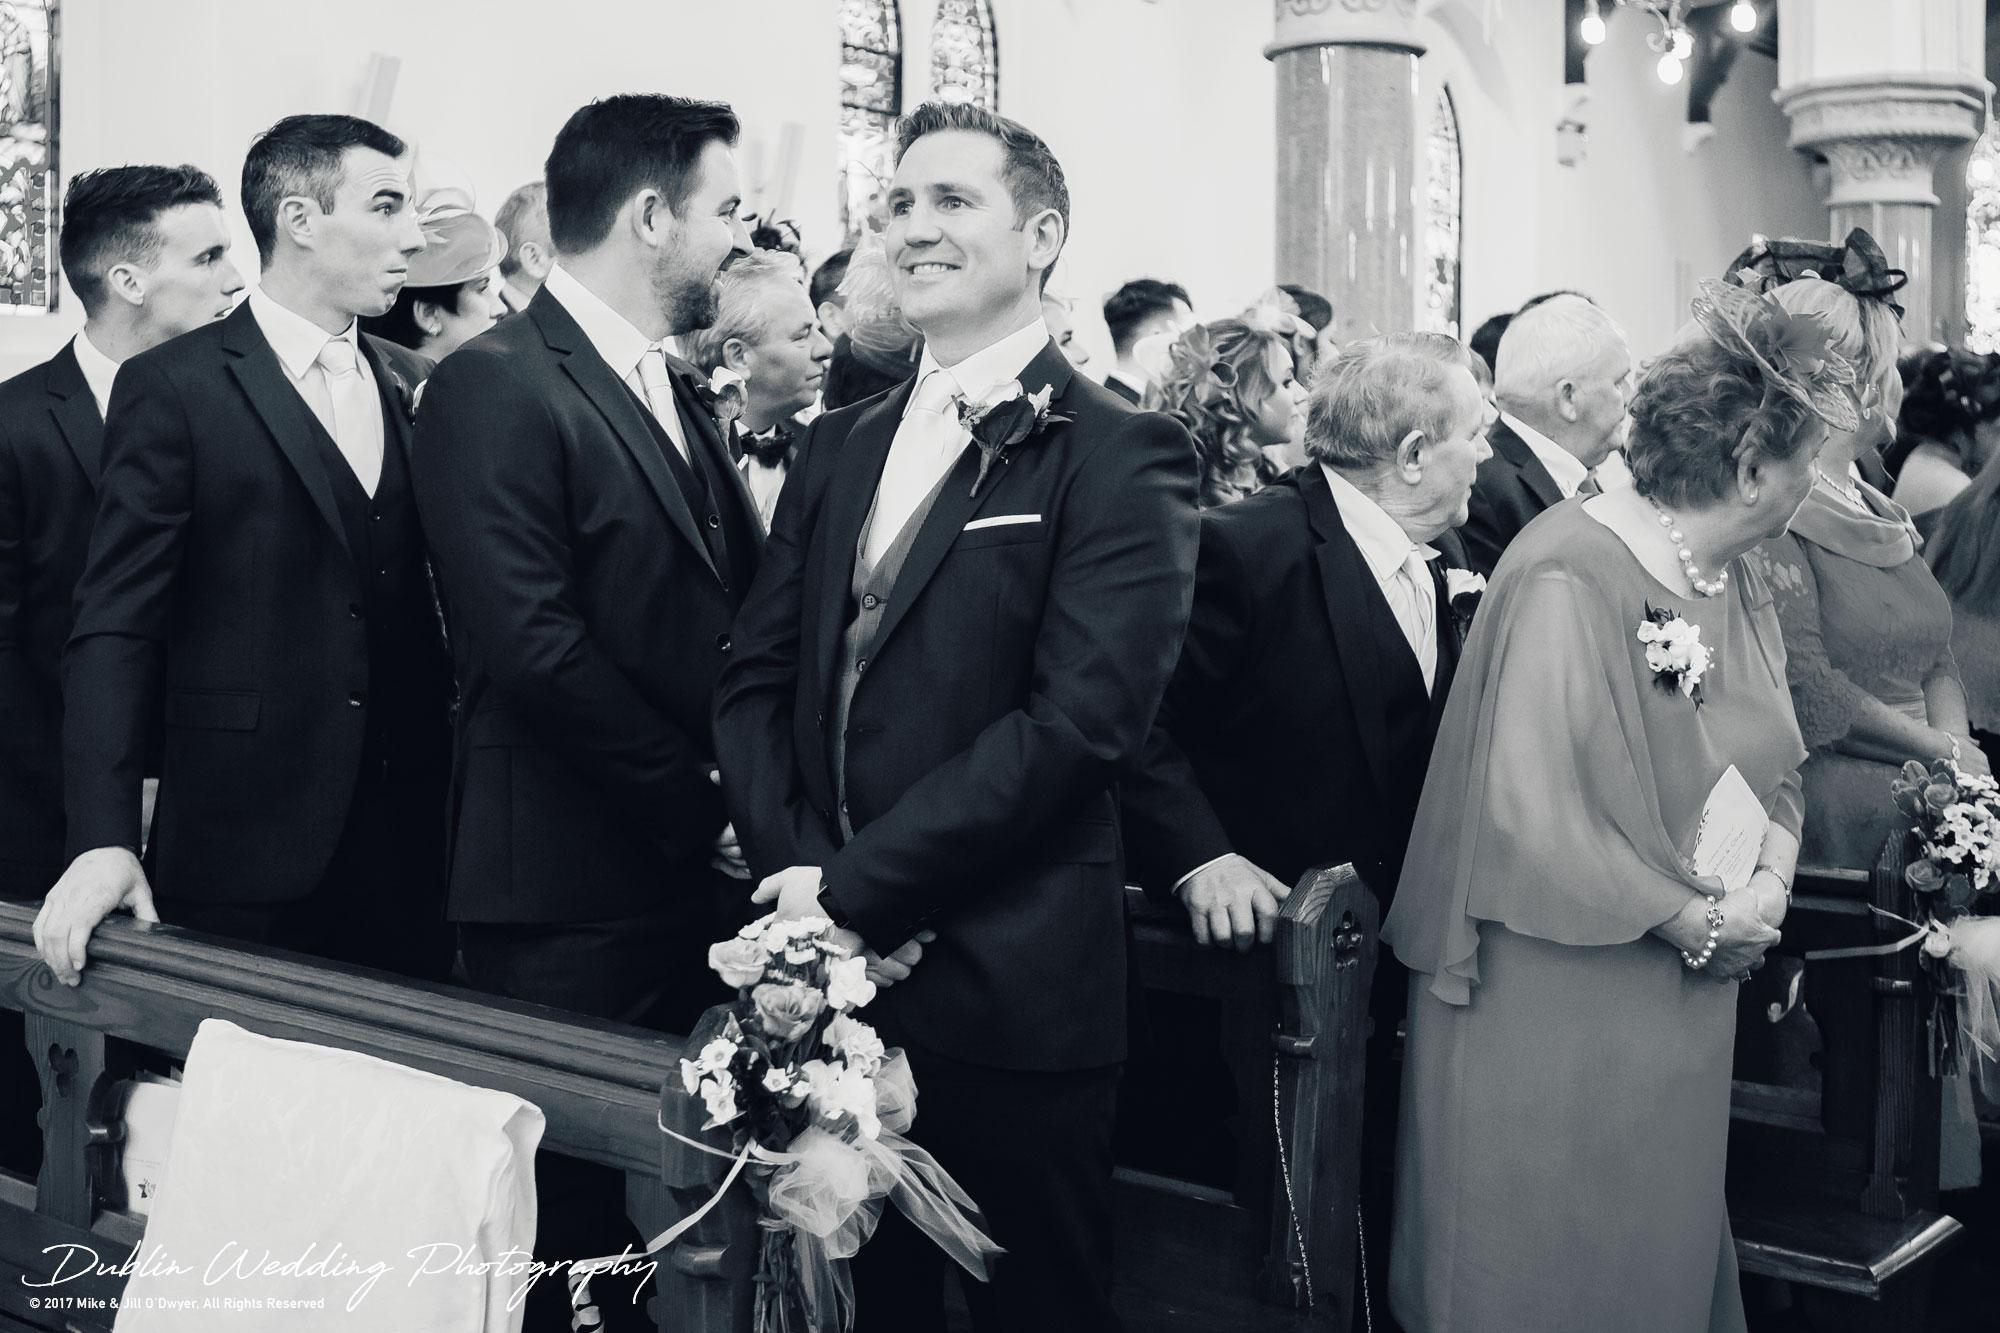 K Club, Kildare, Wedding Photographer, Dublin, Groom happily waiting as Bride walks into Church